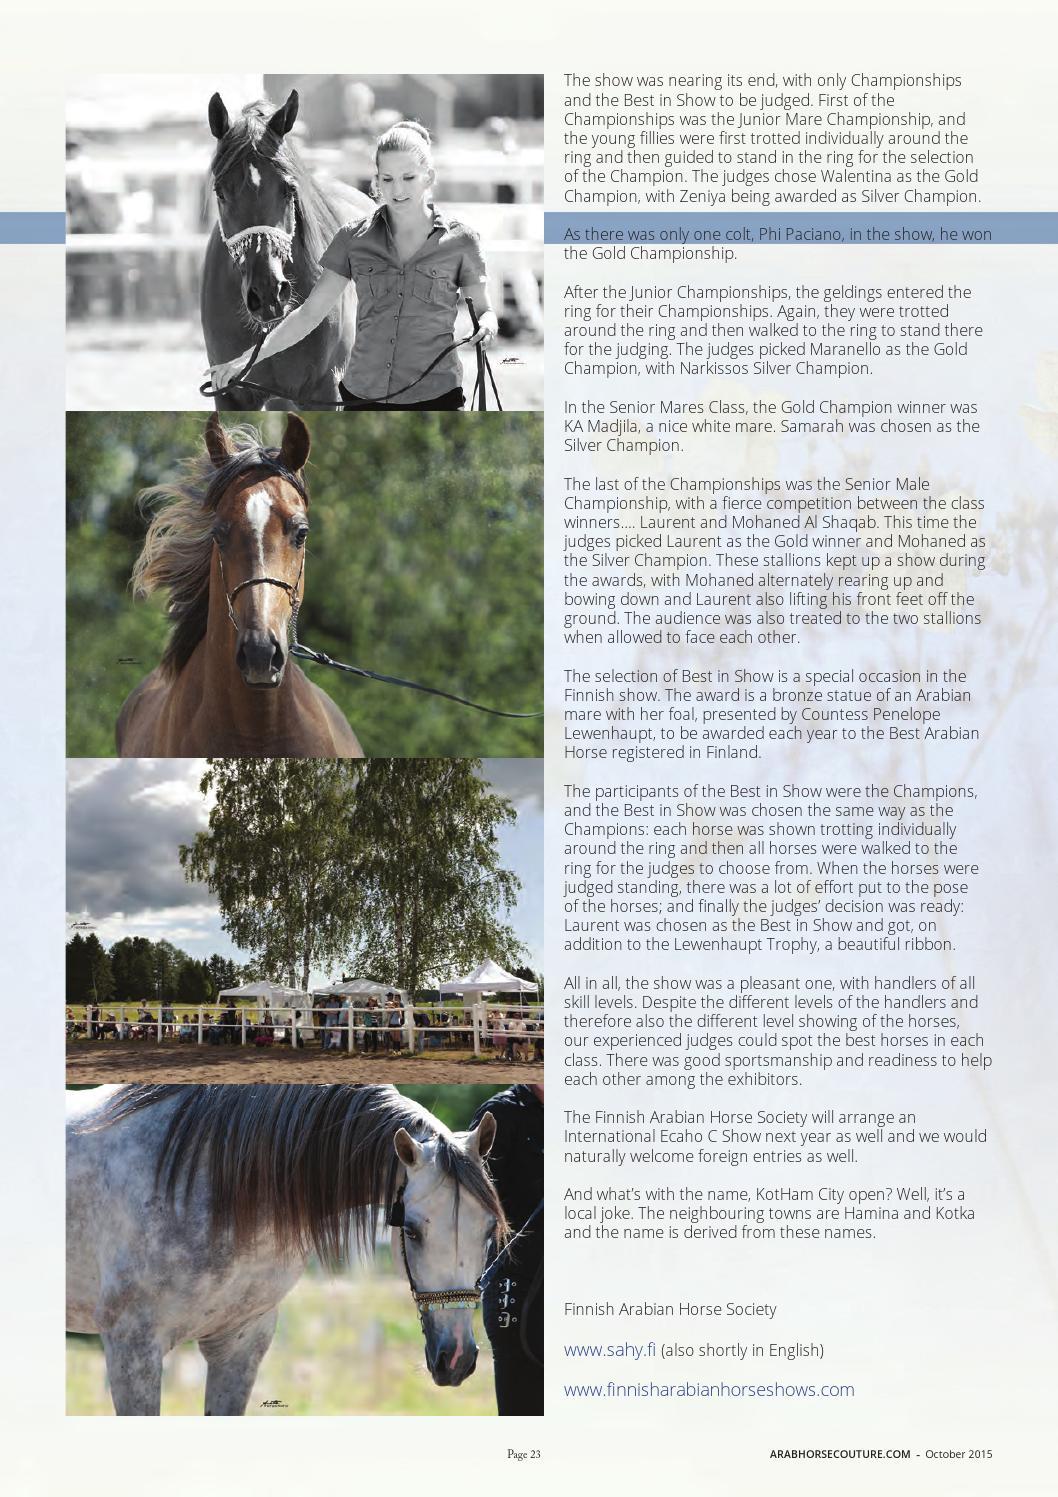 Arab Horse Couture Magazine Oct 2015 By Ljb Publications Llc Issuu